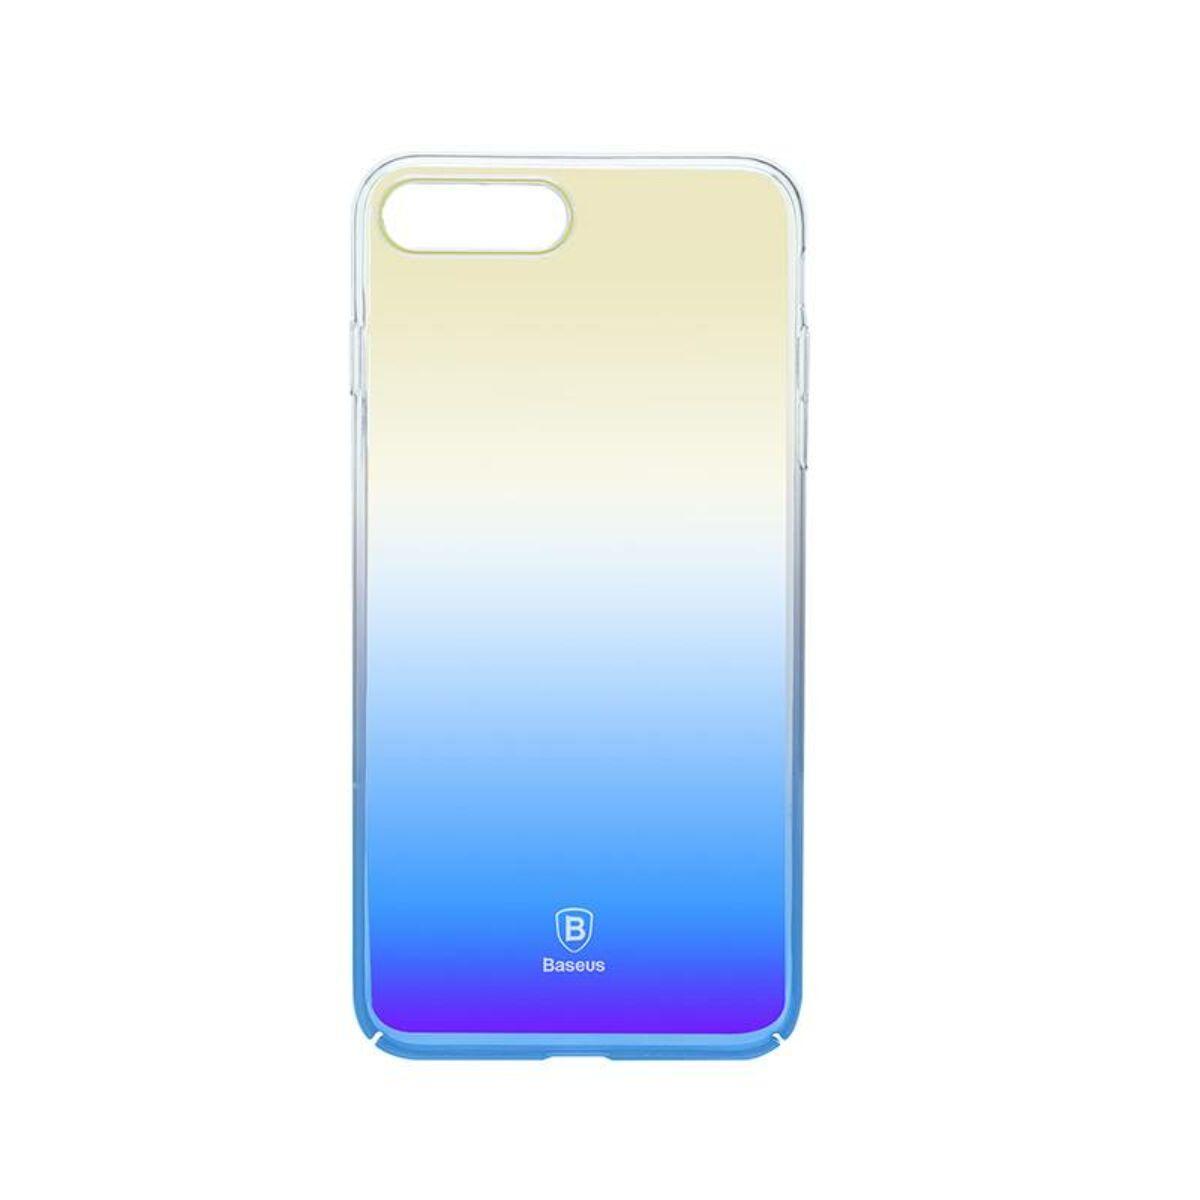 Baseus iPhone 8/7 Plus tok, Glaze, kék (WIAPIPH7P-GC03)